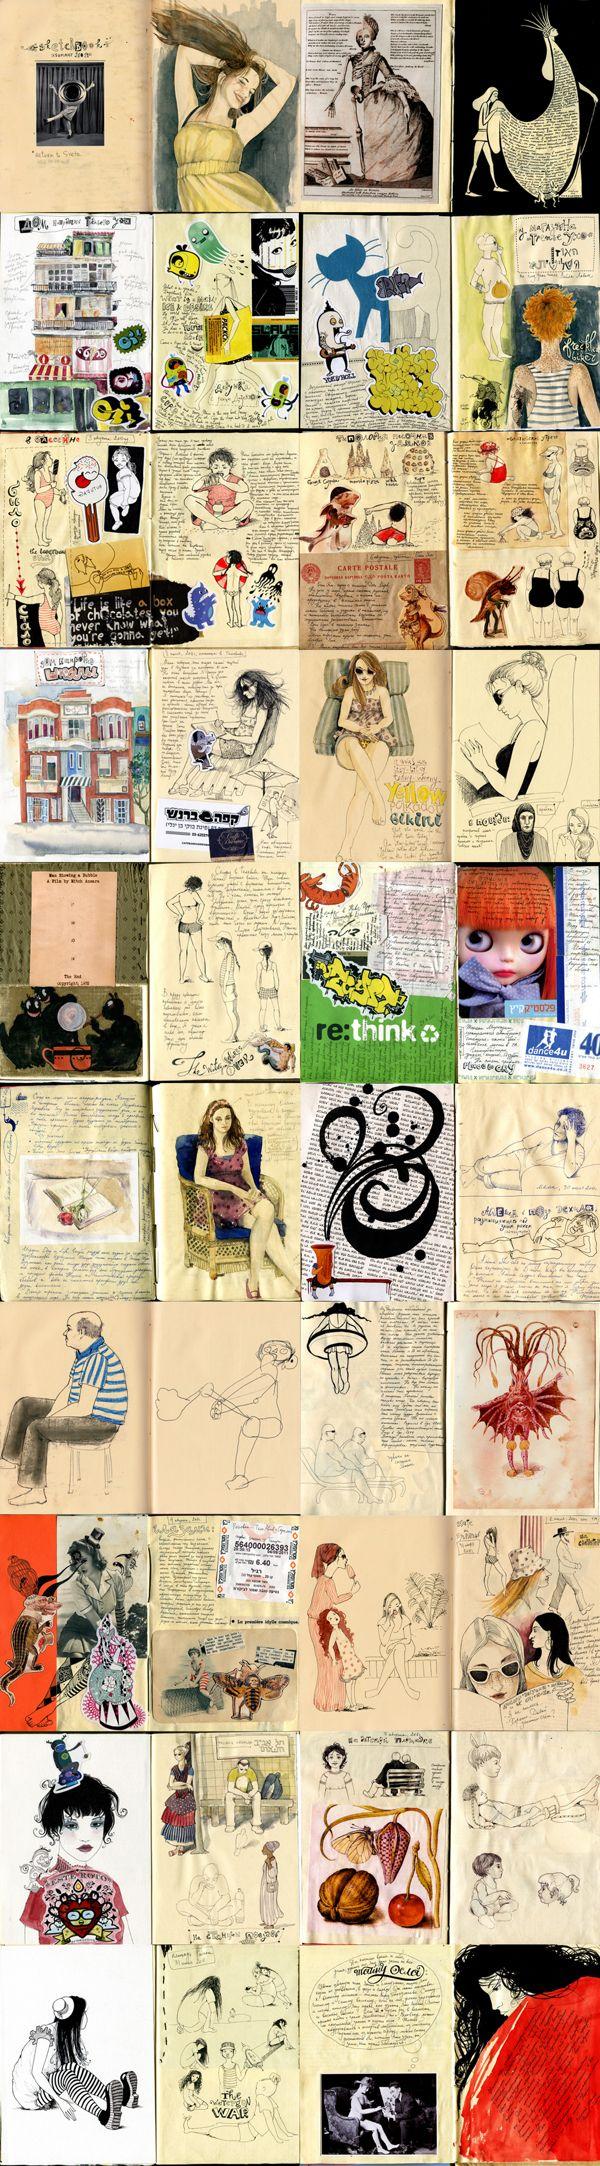 Diaries and workbooks, 2011-2014 by Sveta Dorosheva, via Behance